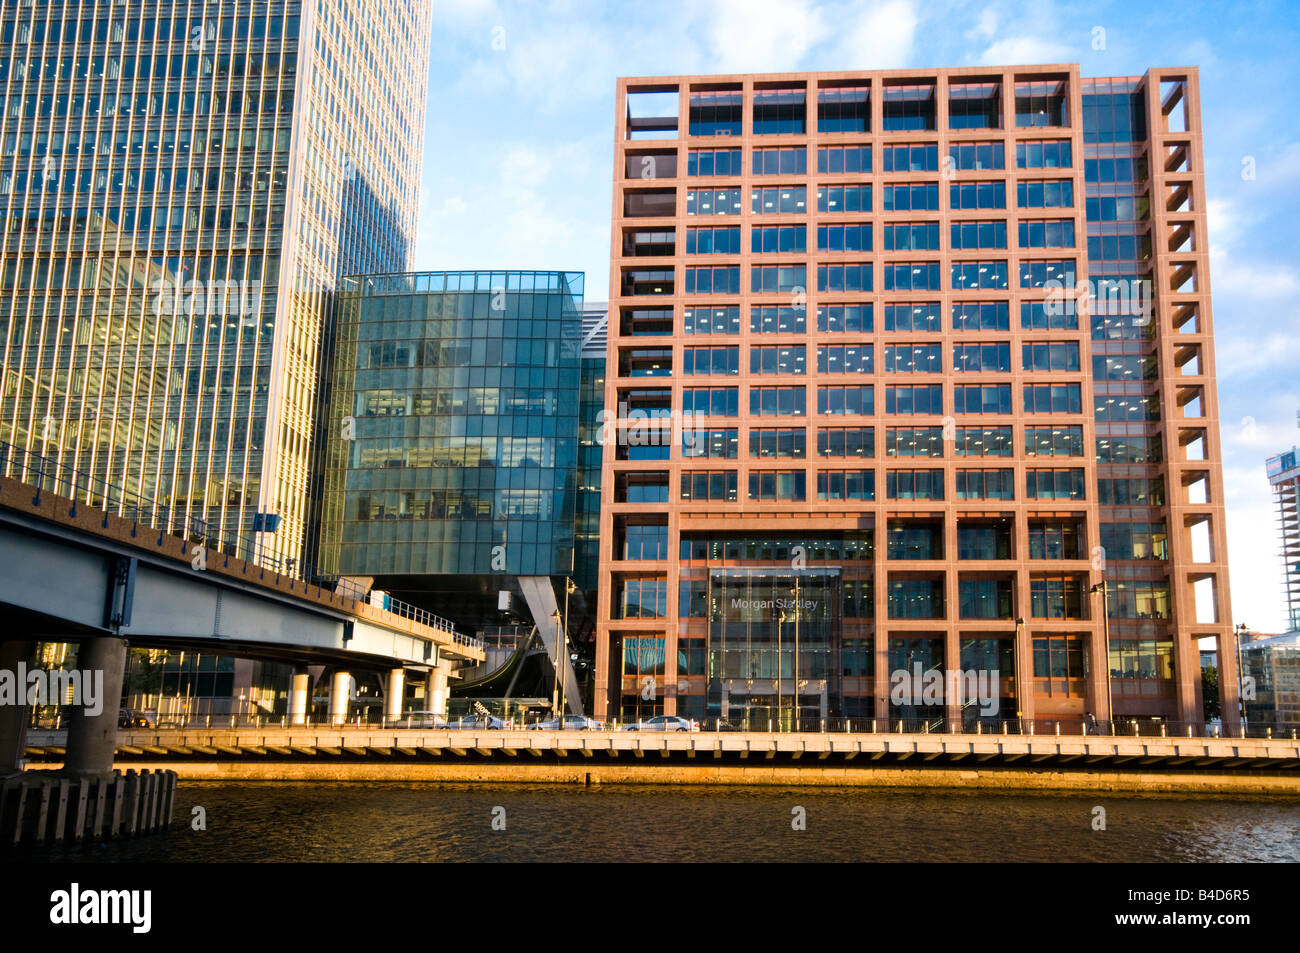 Morgan Stanley building, Canary Wharf, London, UK Stock